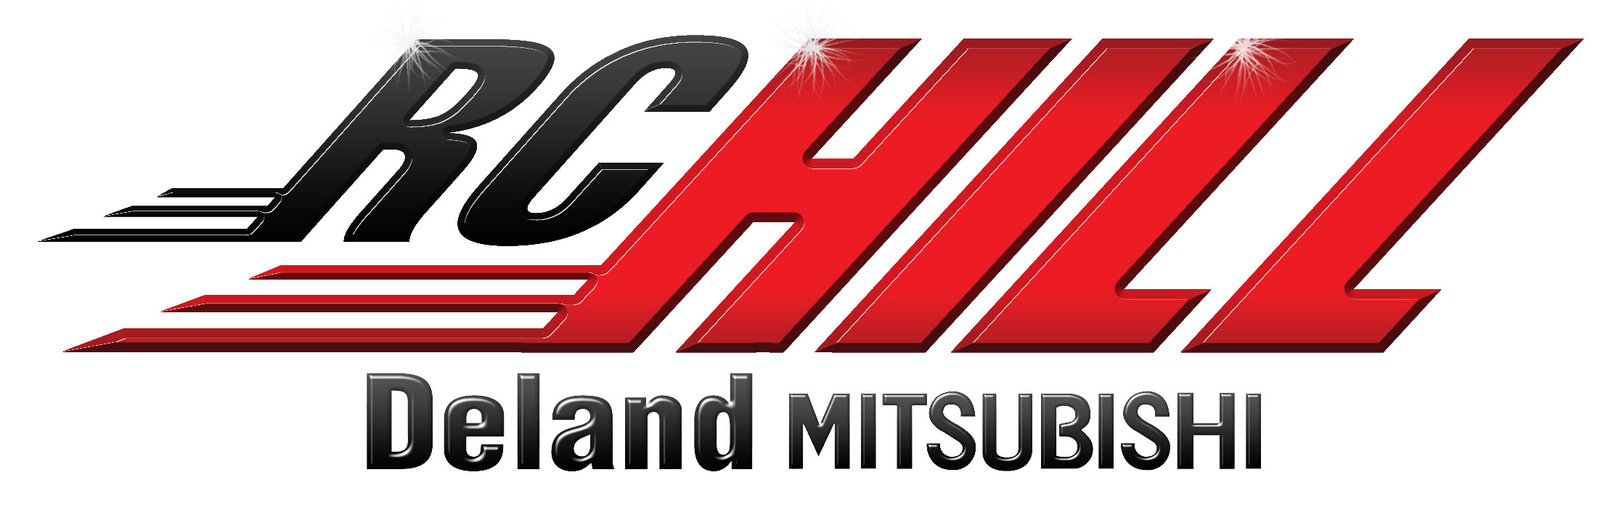 r c hill mitsubishi deland - deland, fl: read consumer reviews